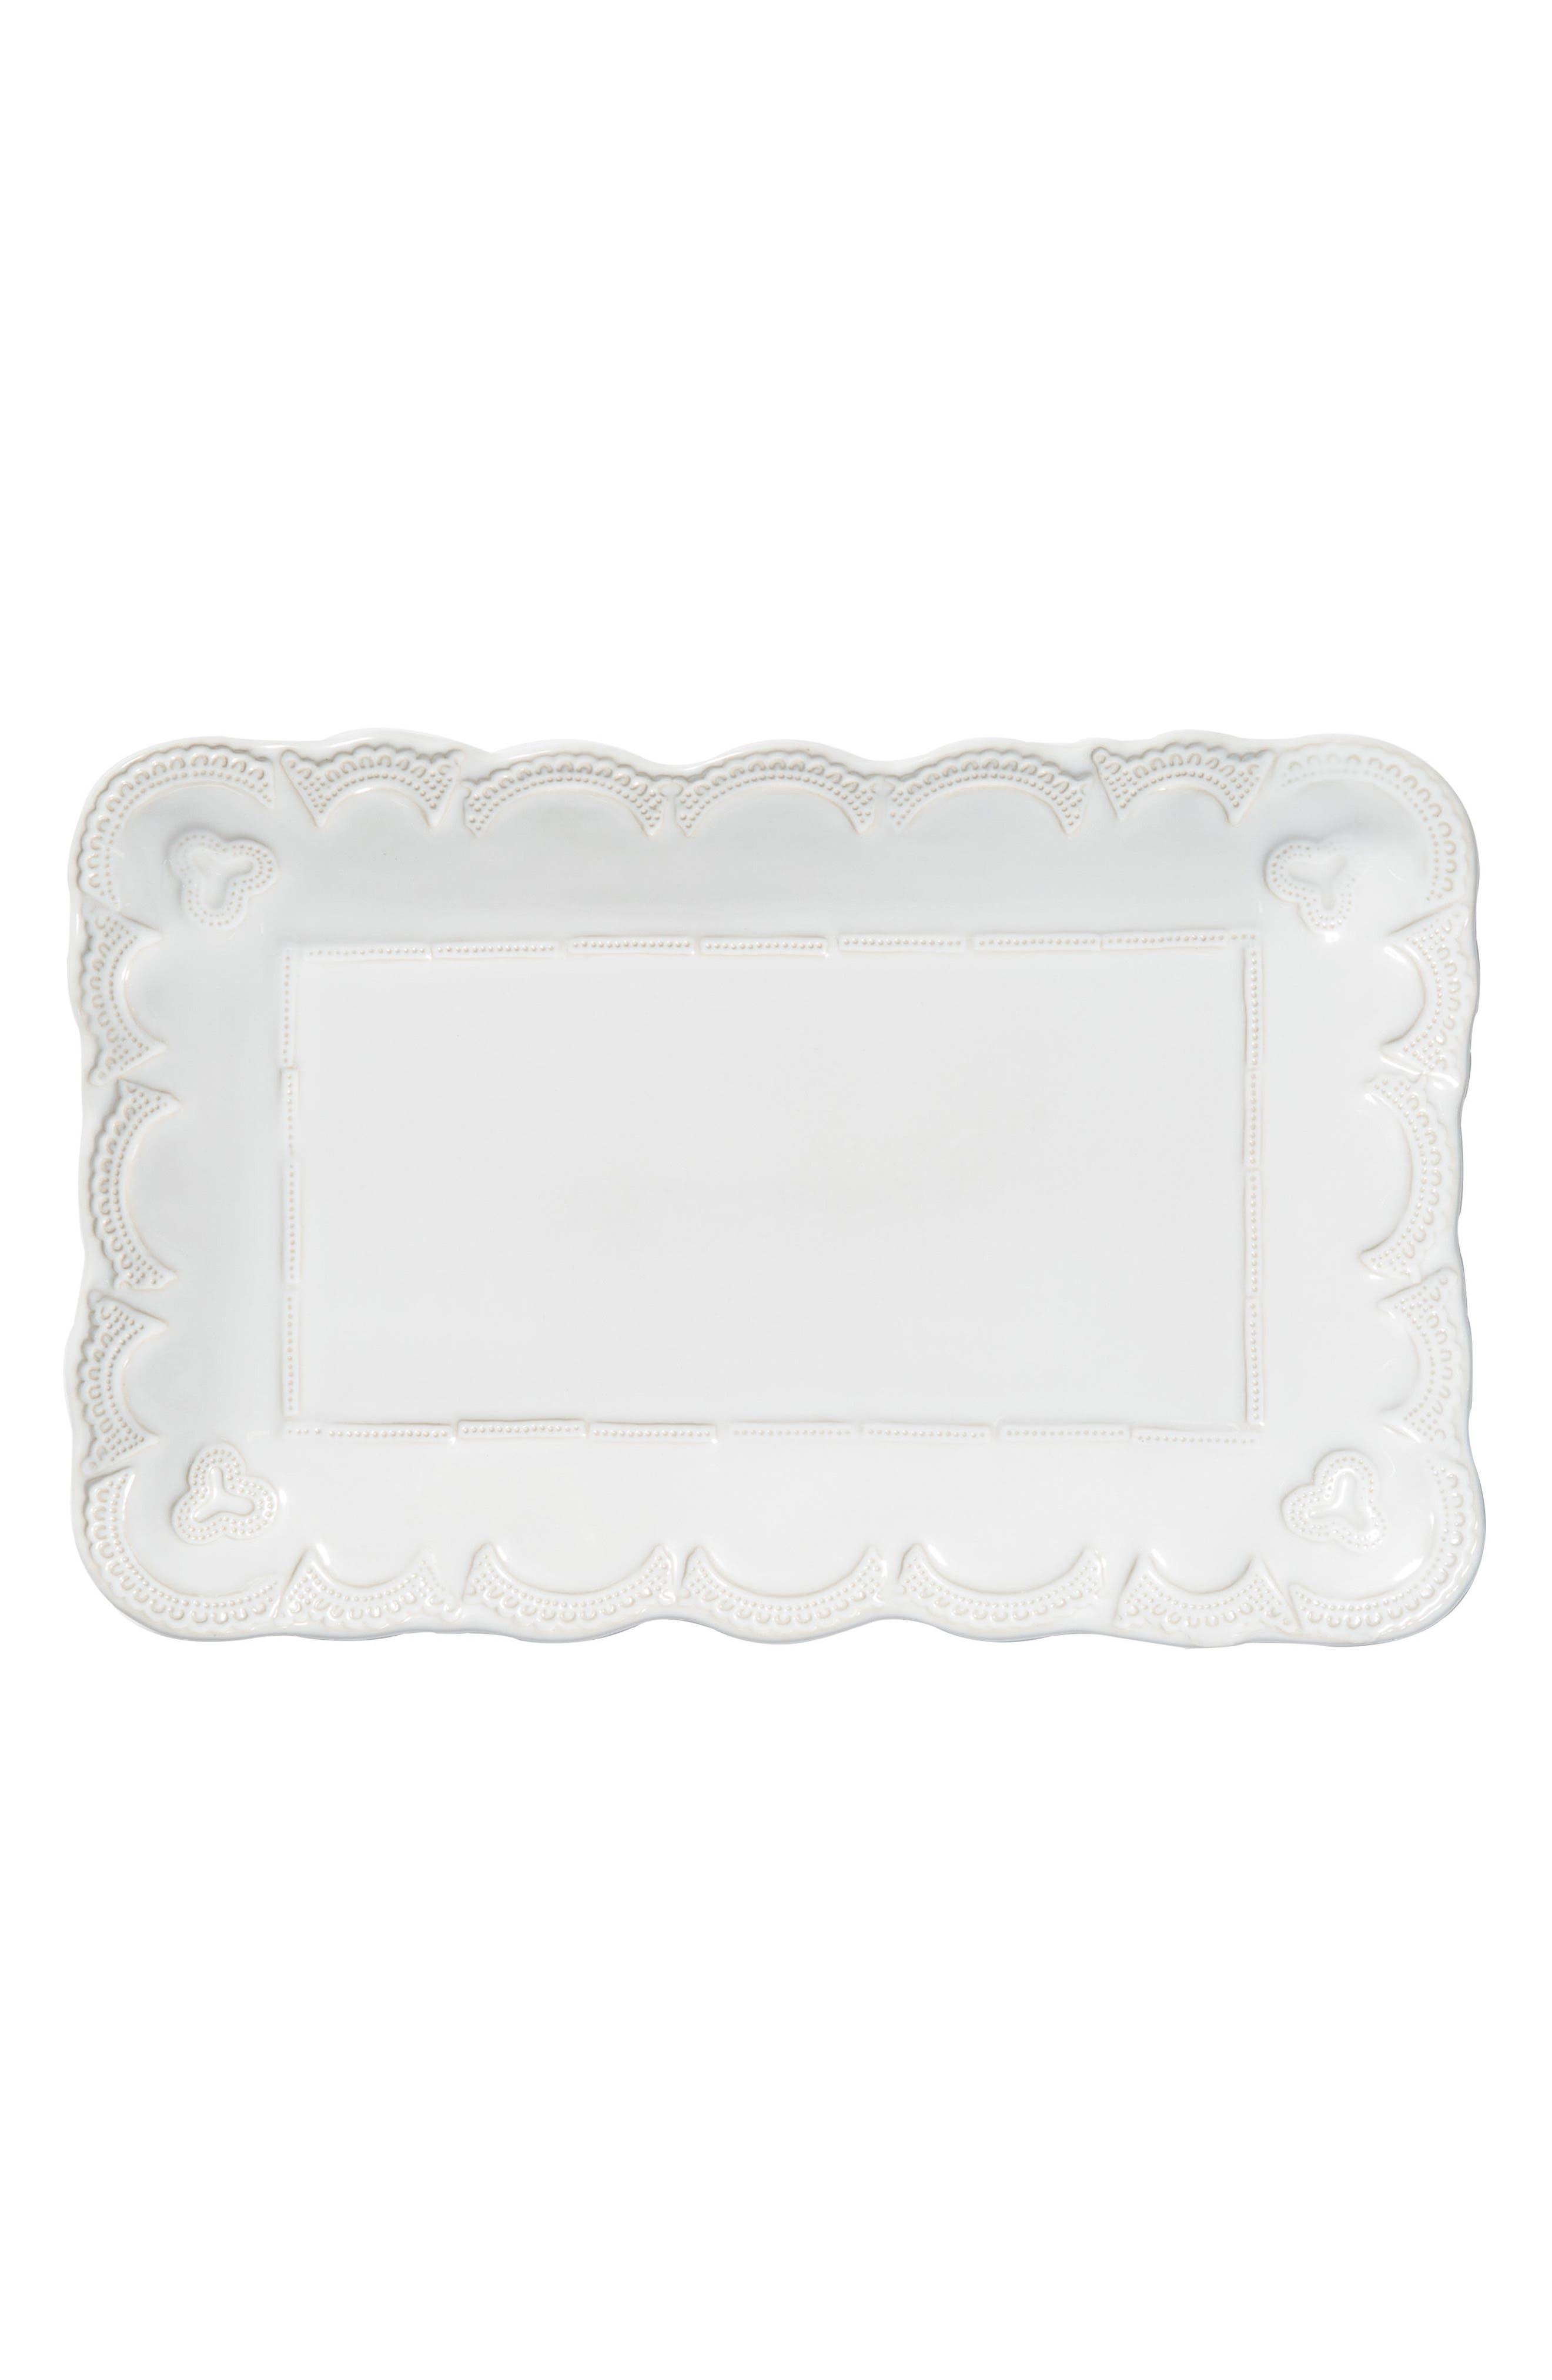 Incanto Stone Lace Small Serving Platter,                             Main thumbnail 1, color,                             WHITE